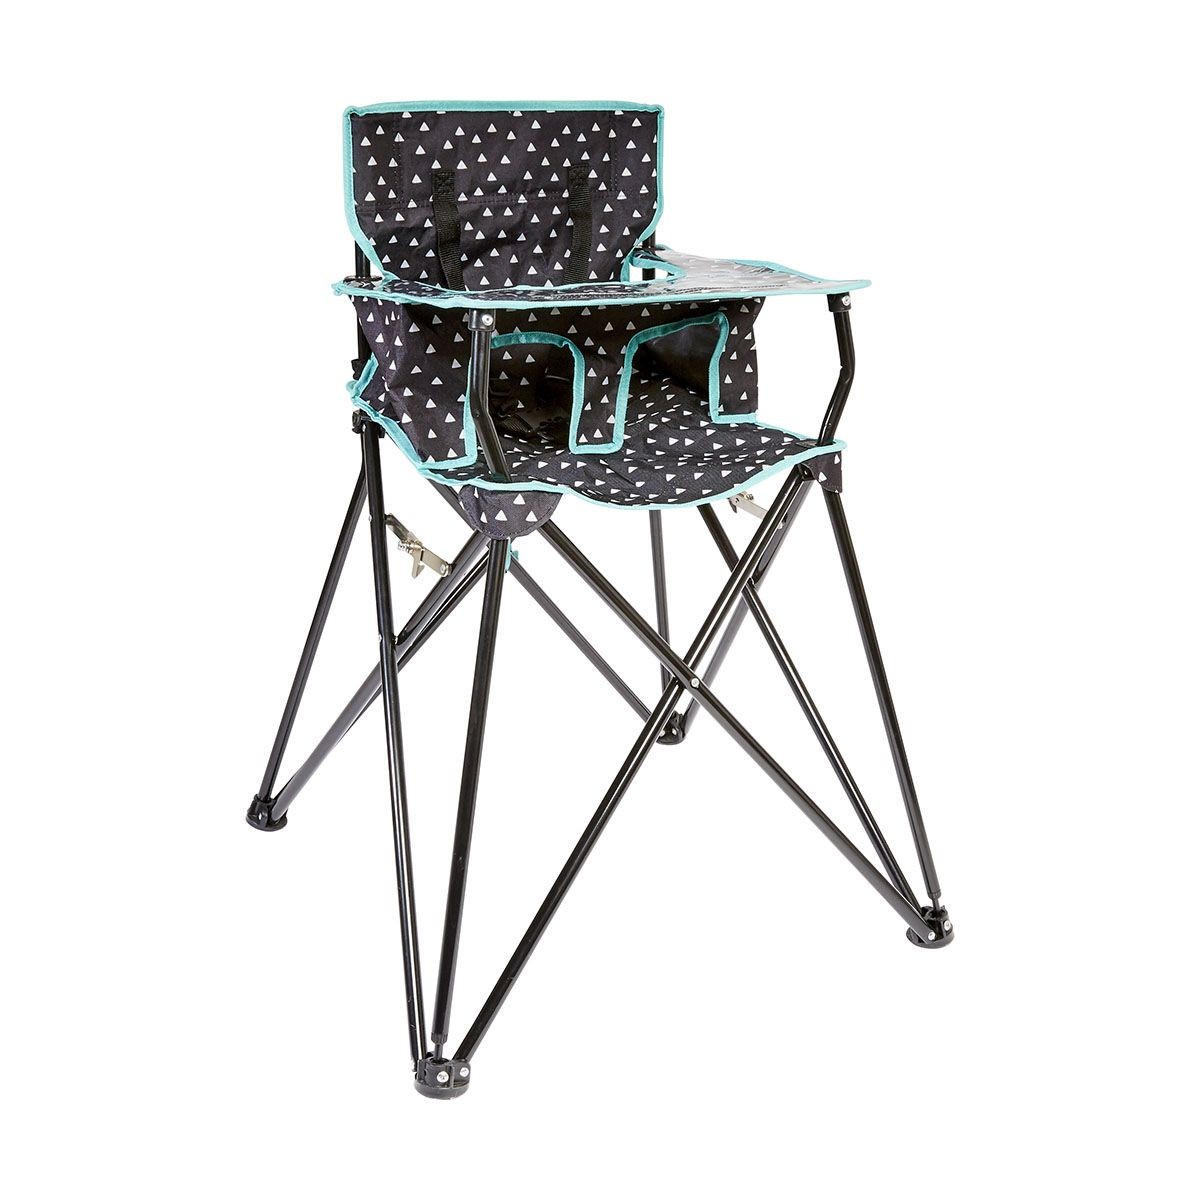 Camping High Folding Chair Kmart Portable High Chairs Chair